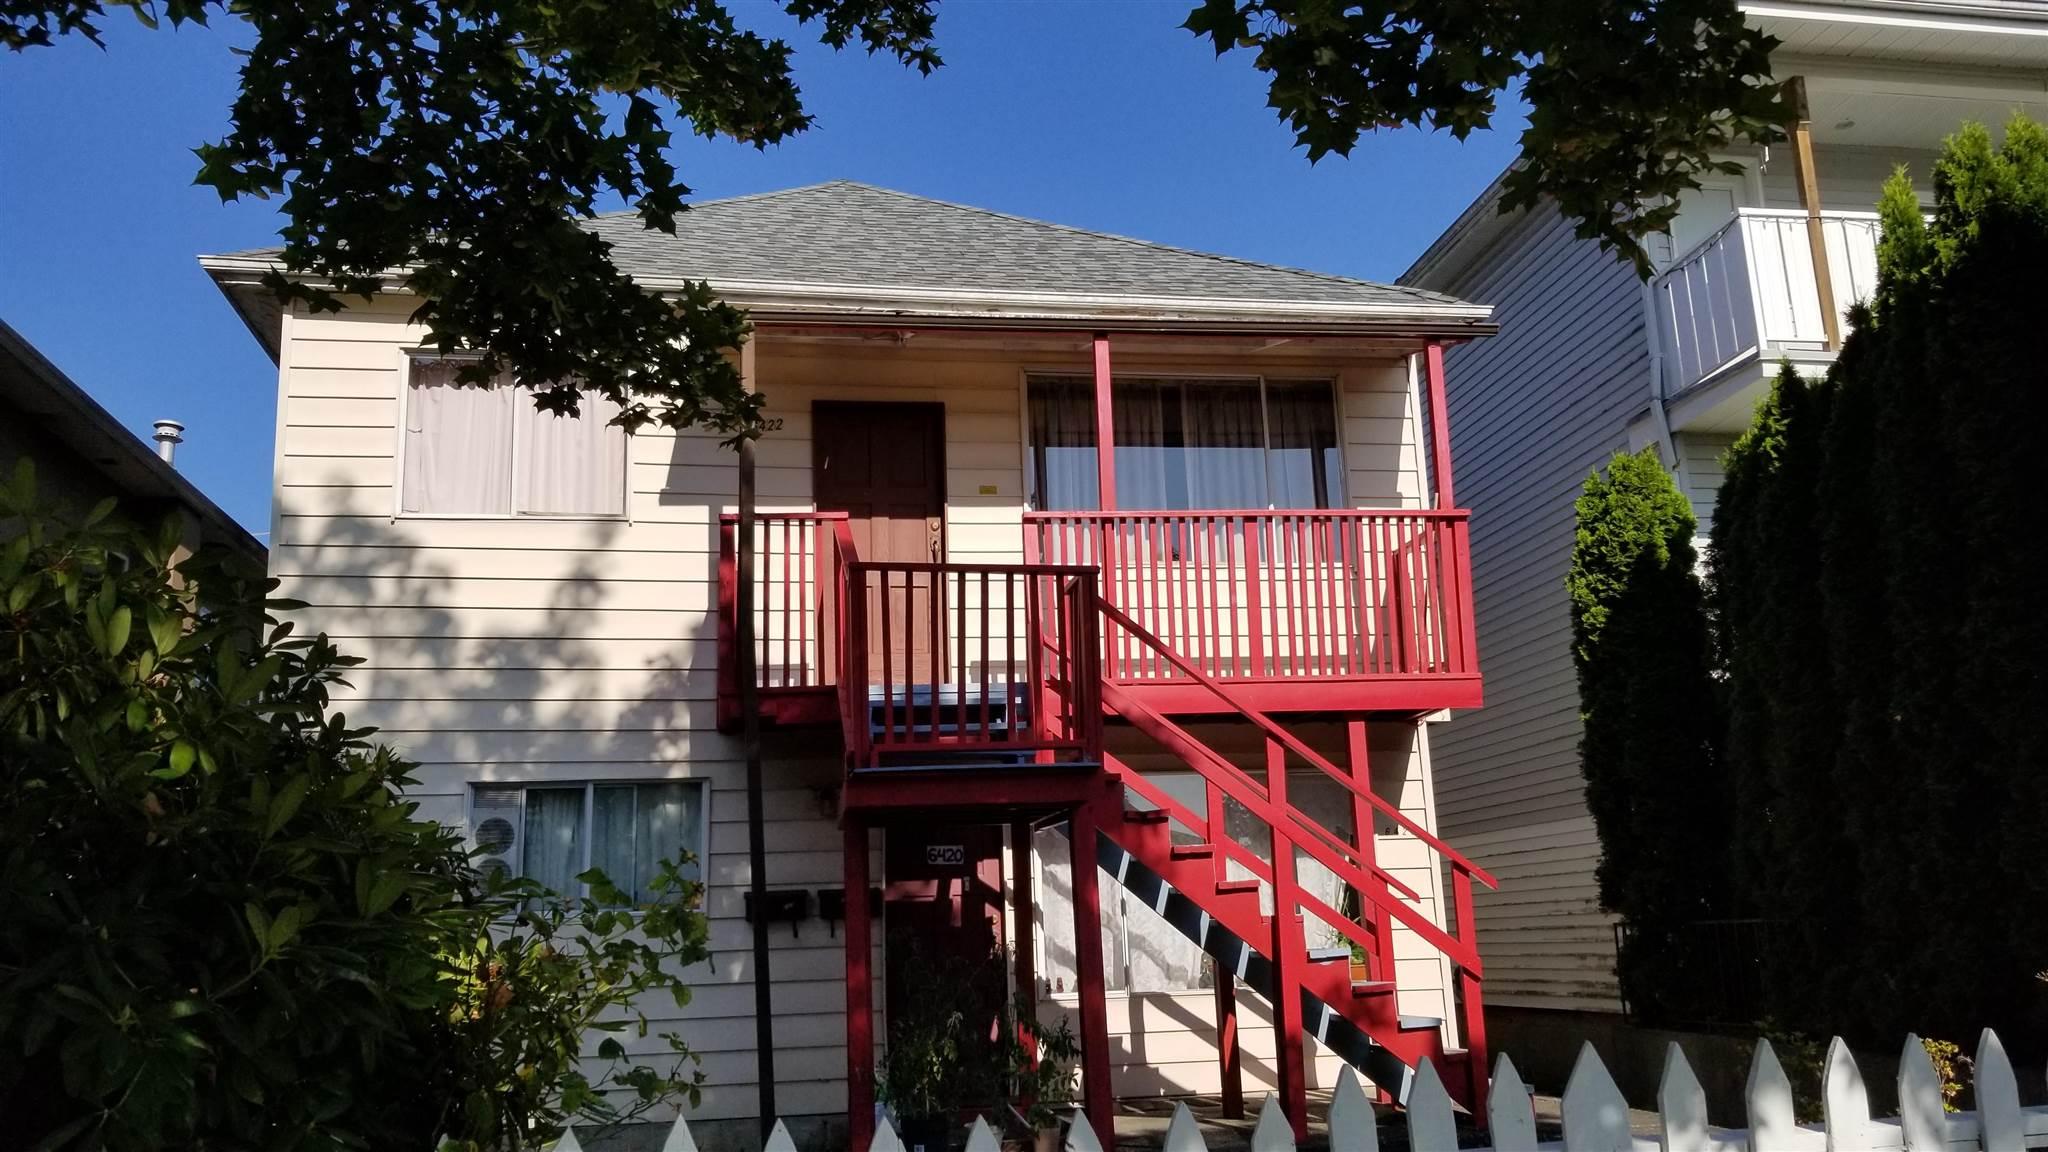 6420 6422 BEATRICE STREET - Killarney VE Duplex for sale, 6 Bedrooms (R2605002) - #1